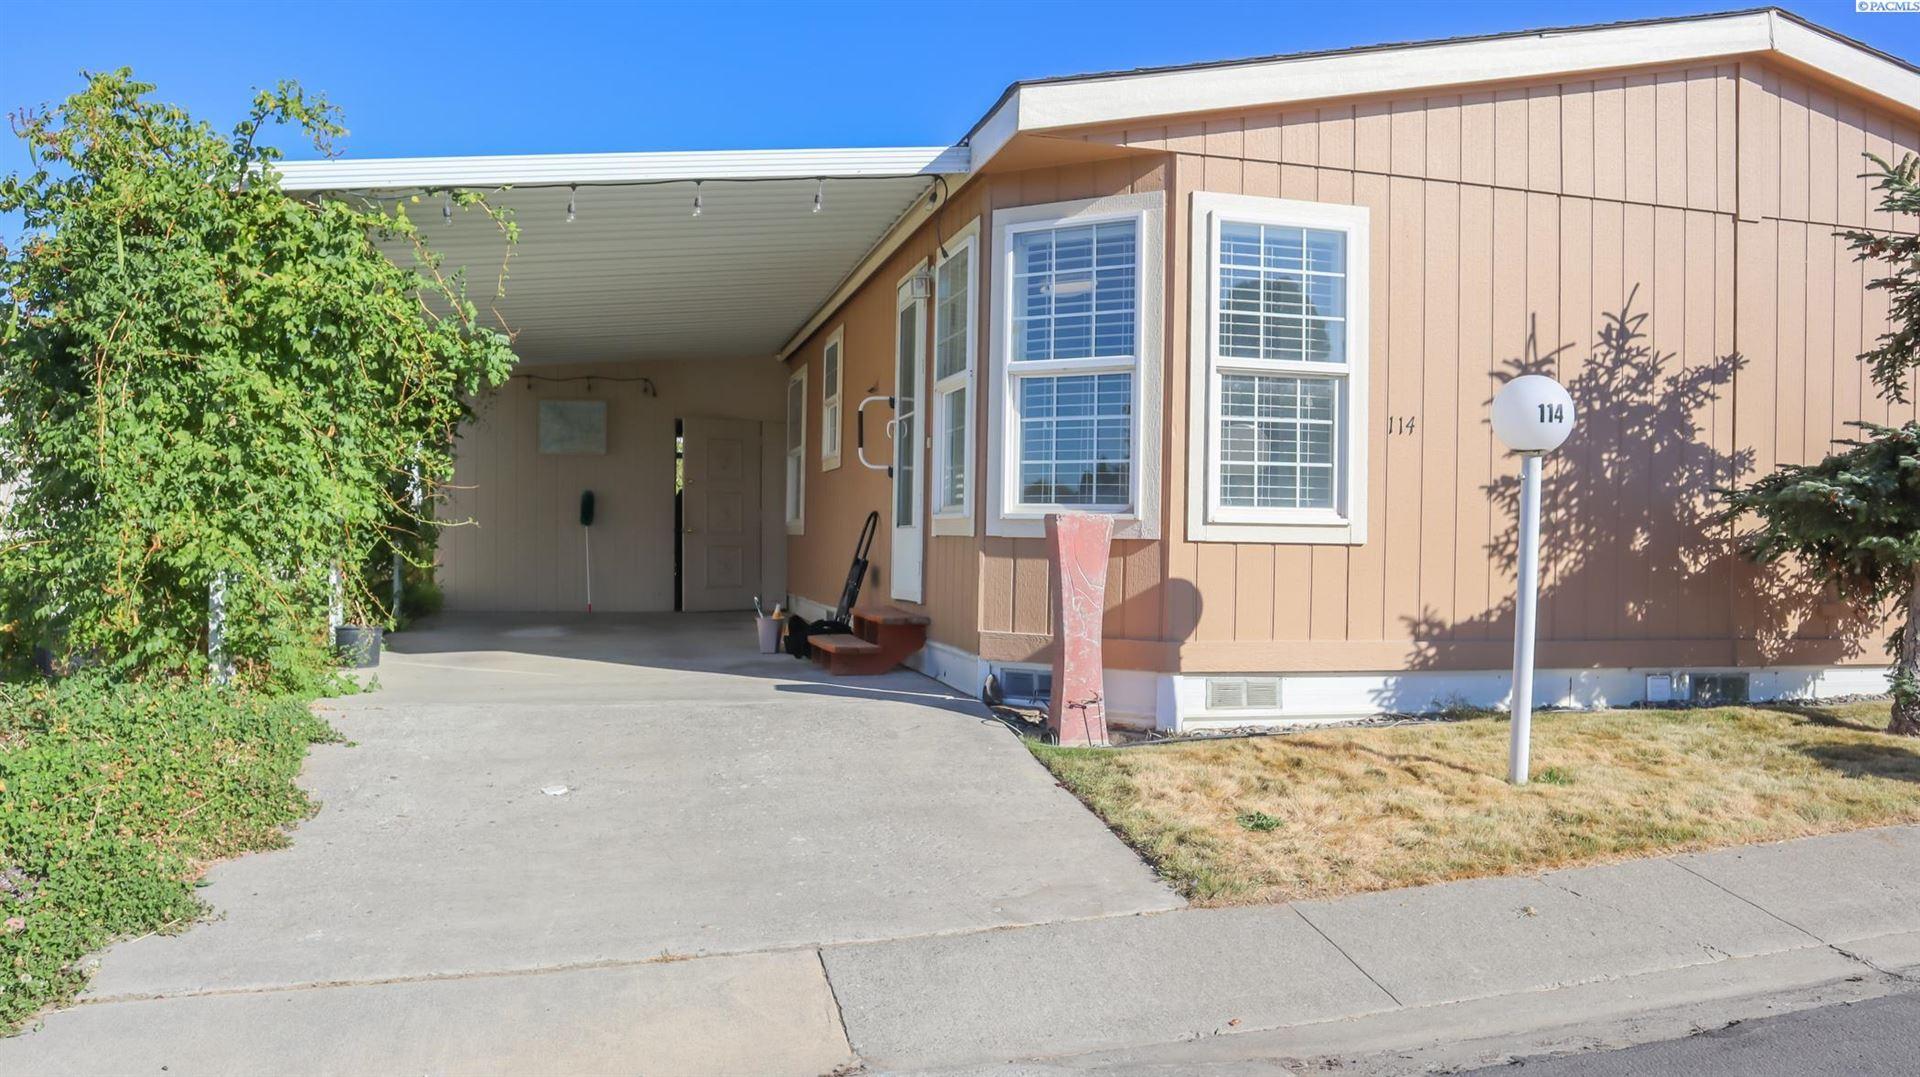 Photo of 7901 W Clearwater Avenue #114, Kennewick, WA 99336 (MLS # 256616)